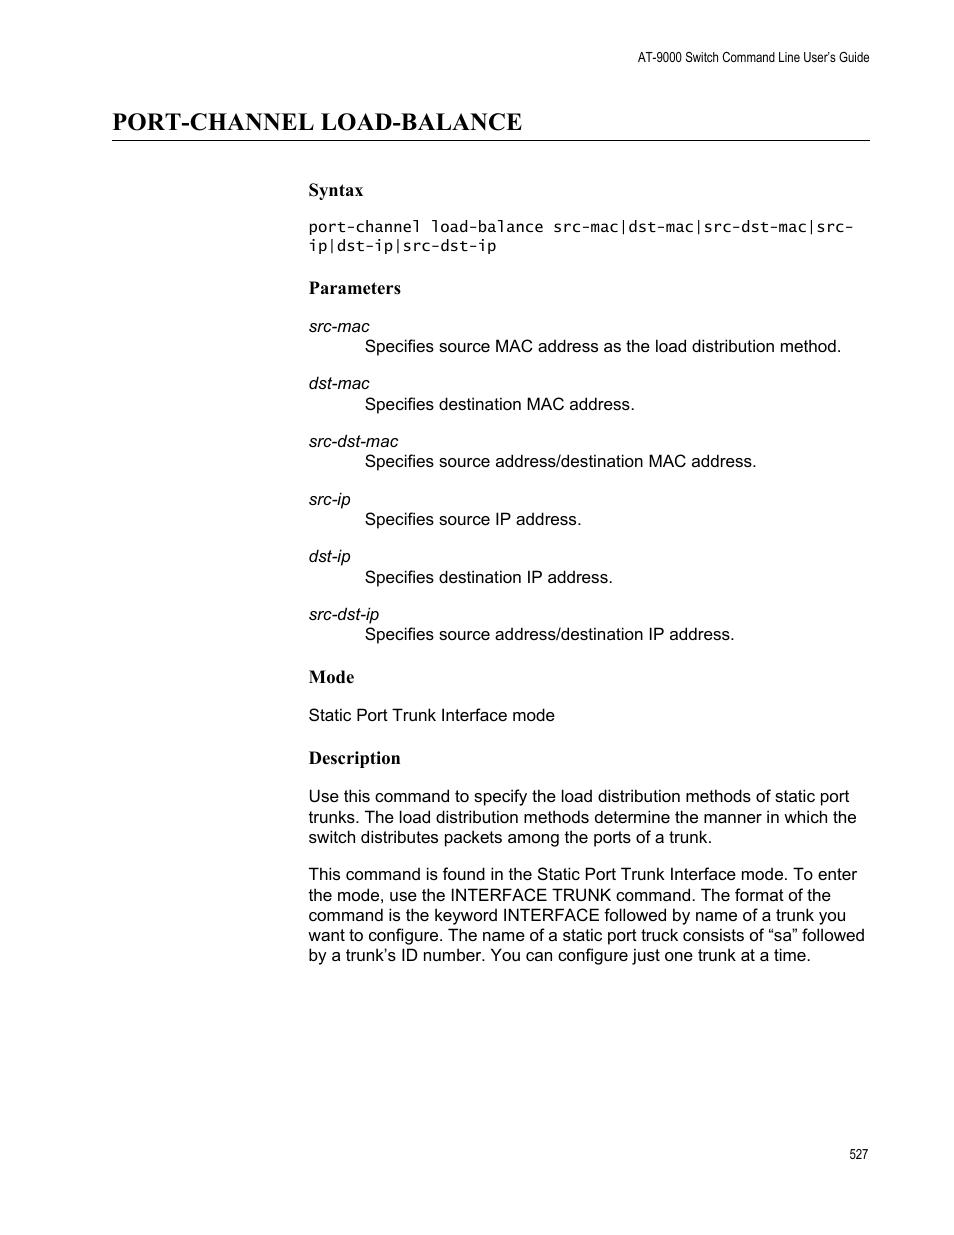 allied telesis at 9000 manual